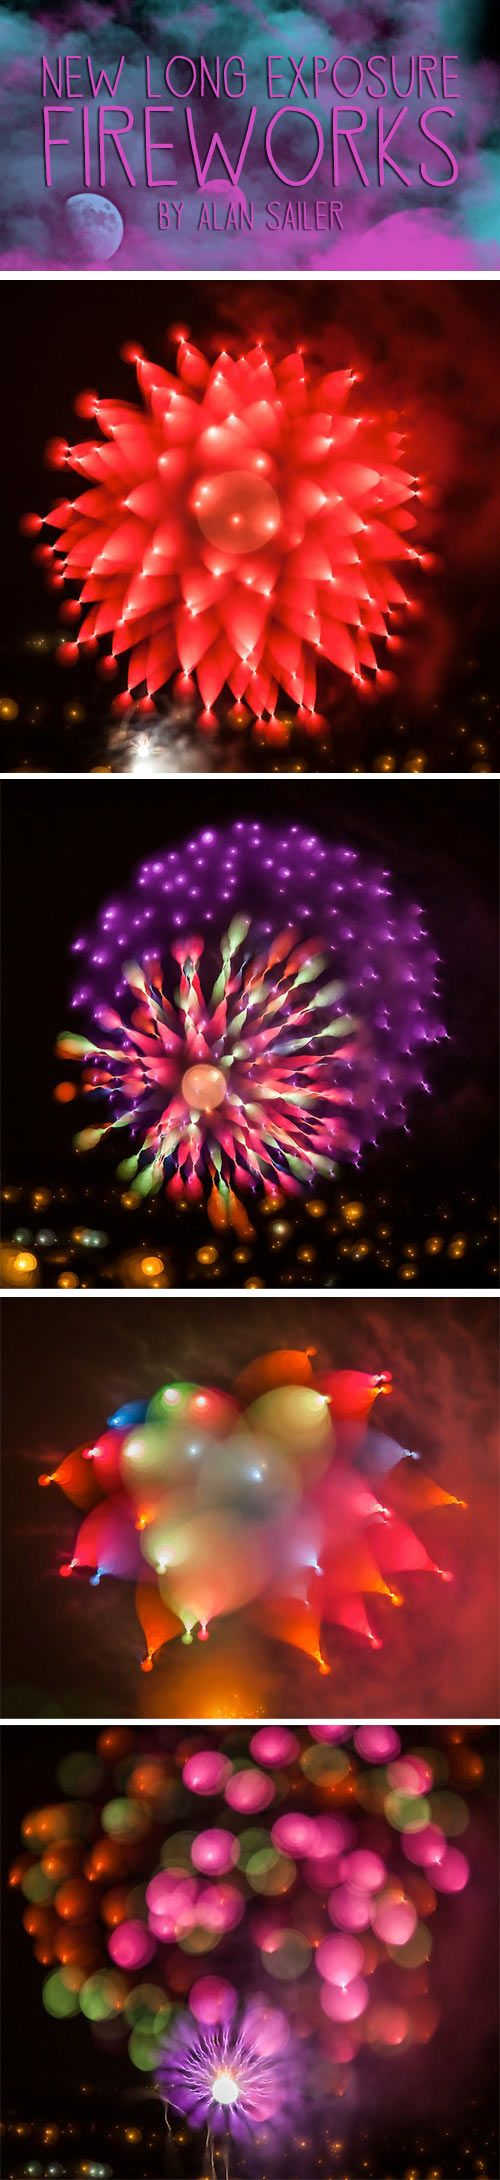 Long exposure fireworks...